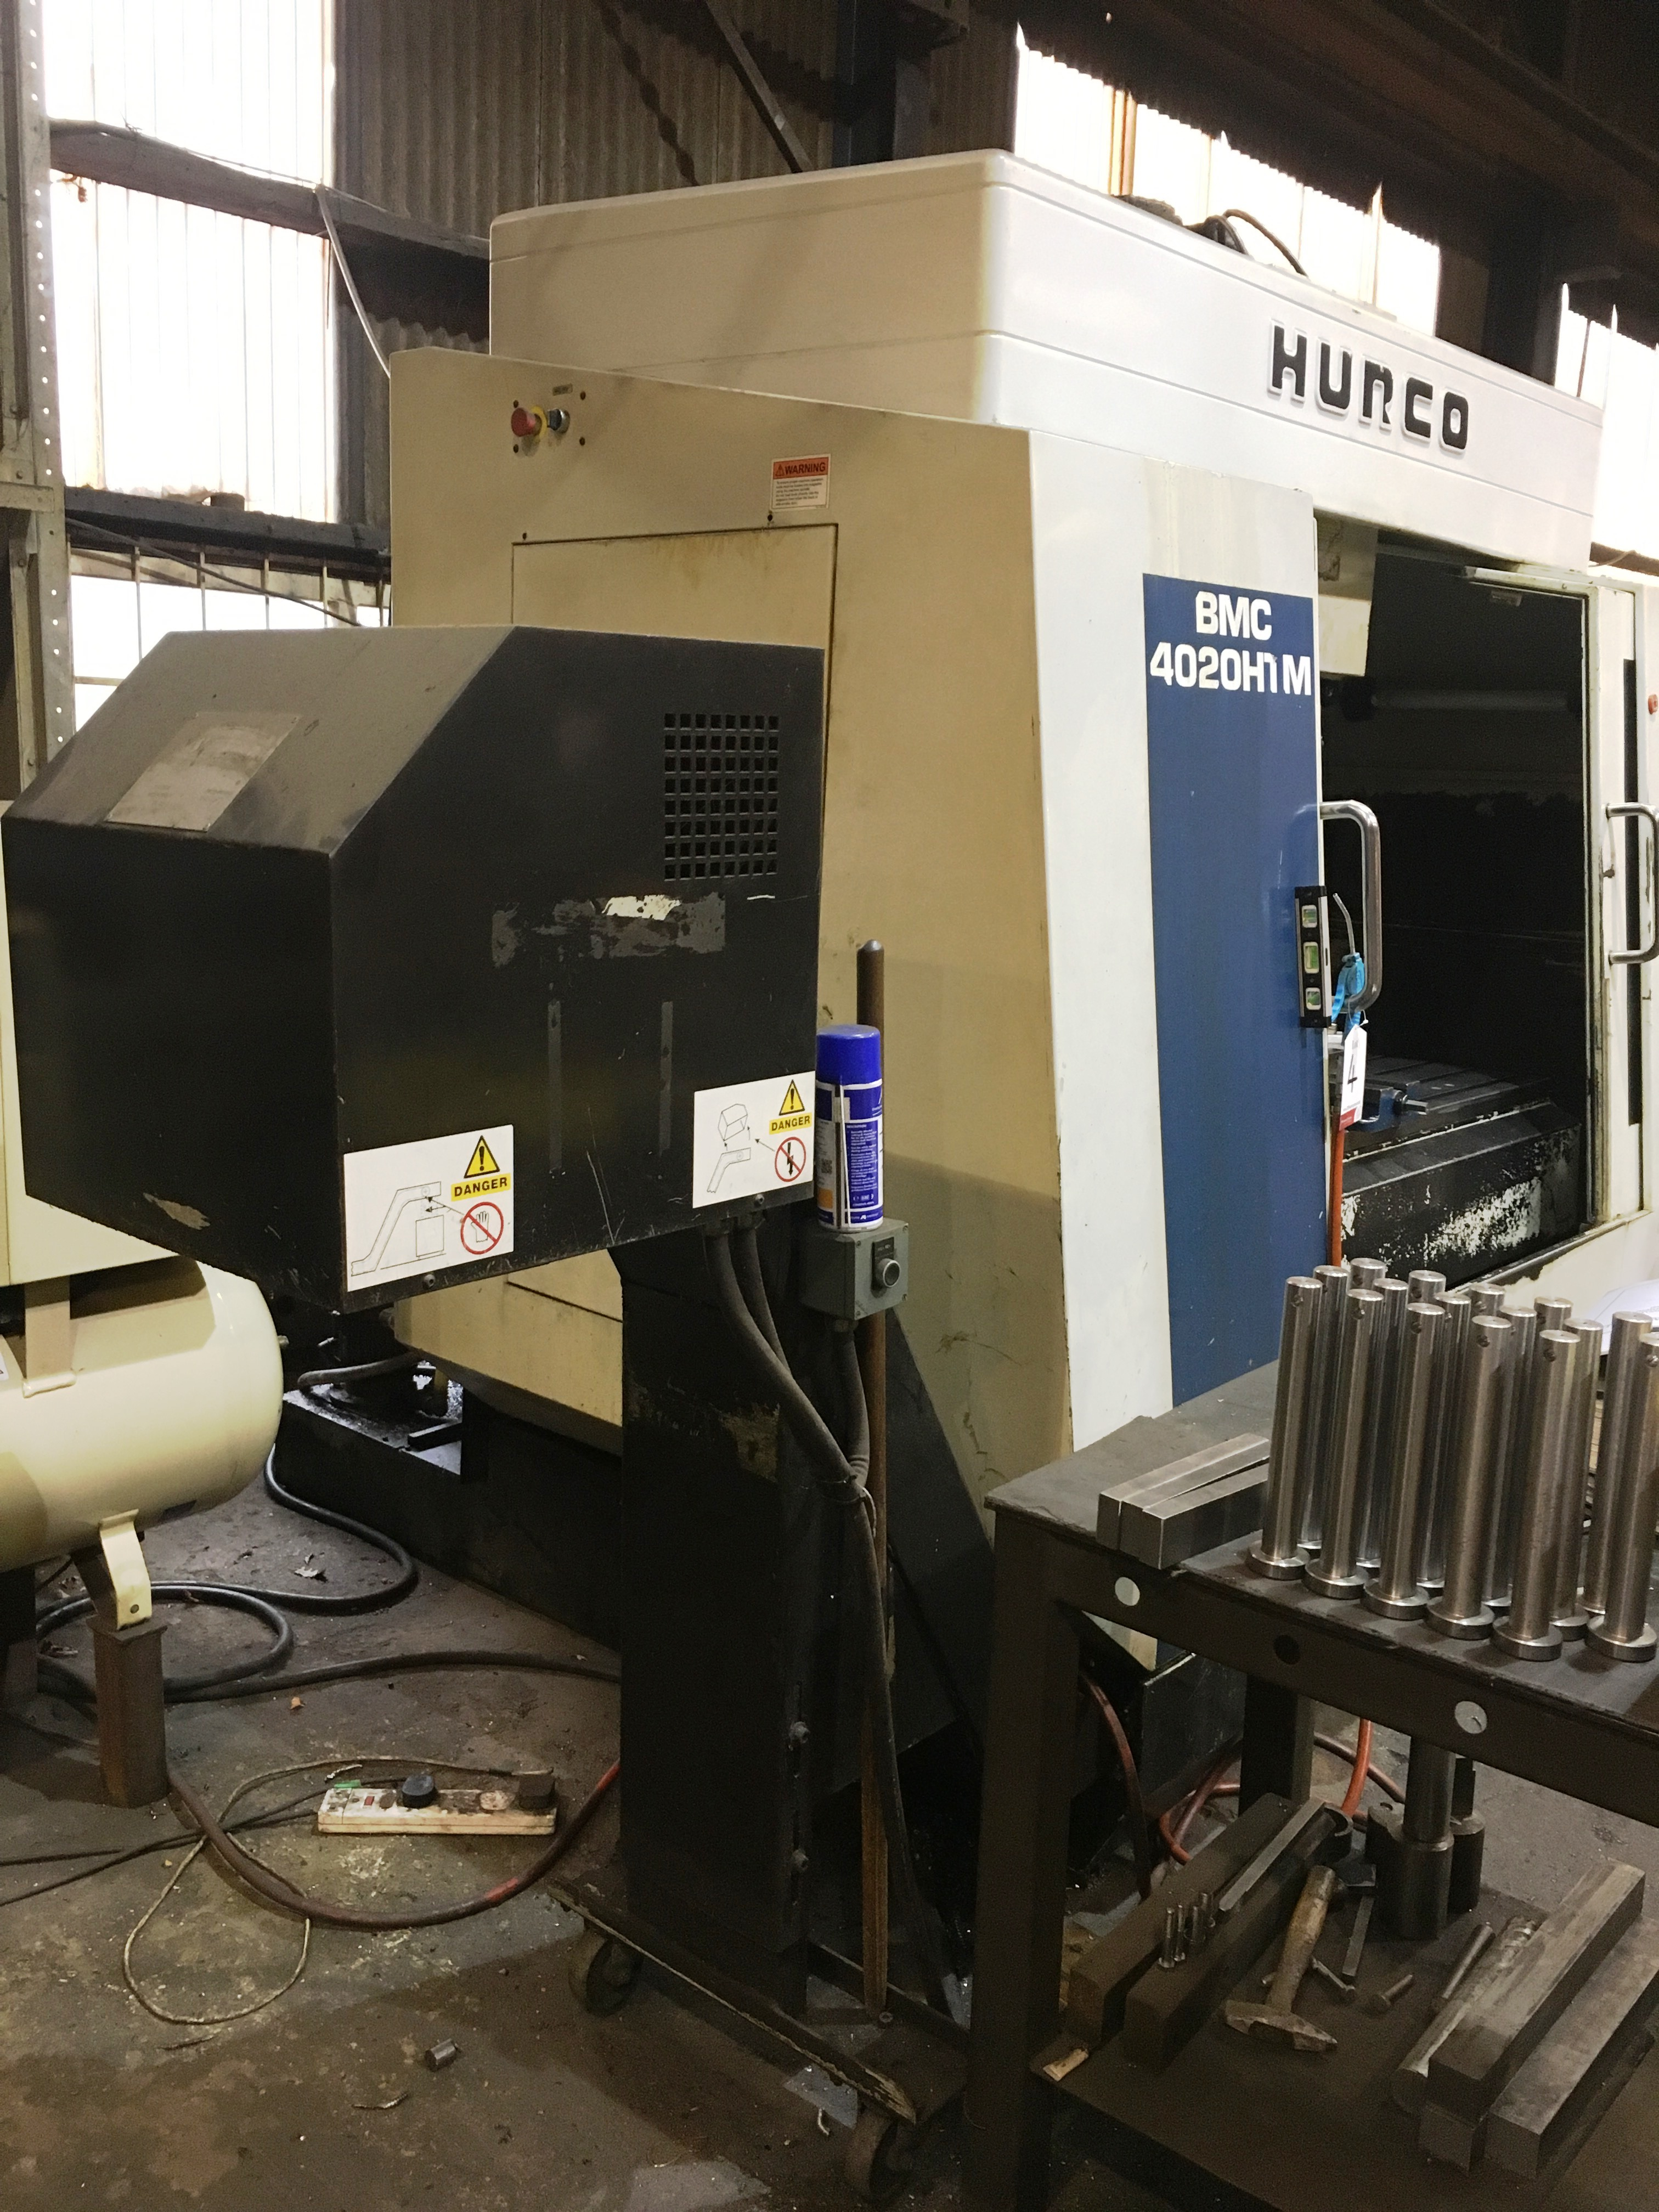 Hurco BMC 4020 HT/M CNC Vertical Machining Centre | YOM: 2000 - Image 6 of 16